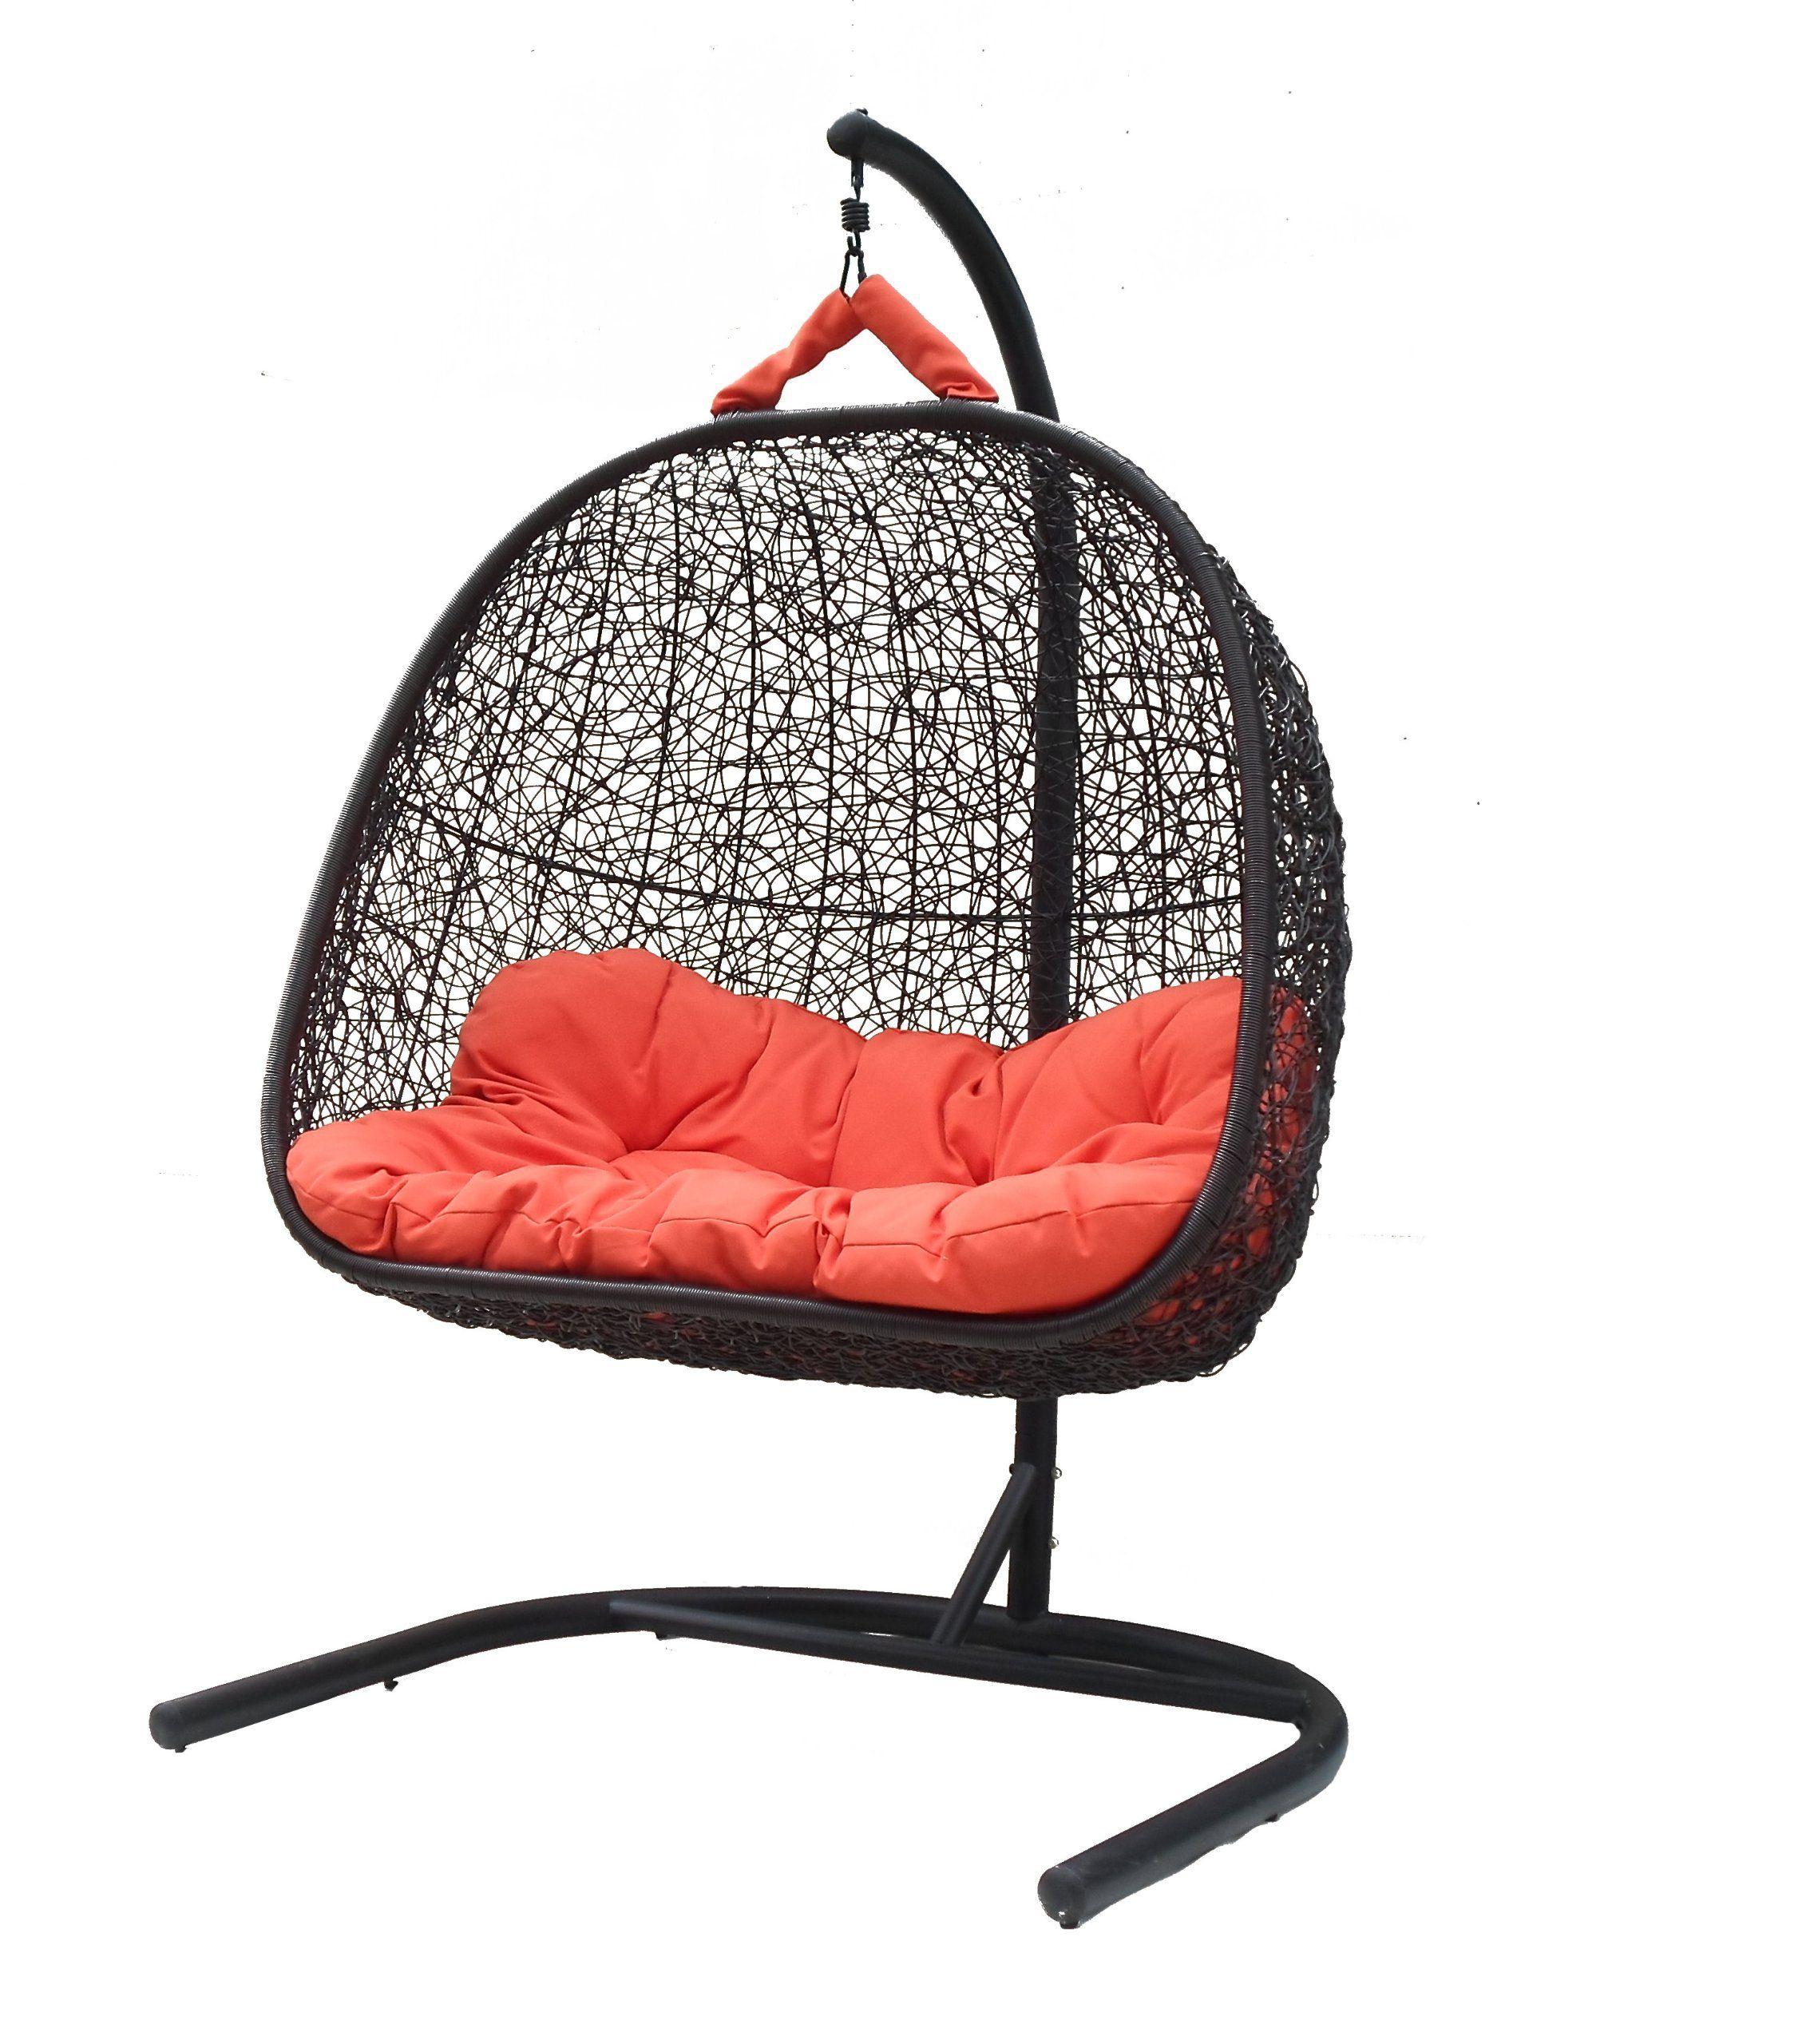 corina dual sitting outdoor wicker swing chair great hammocks